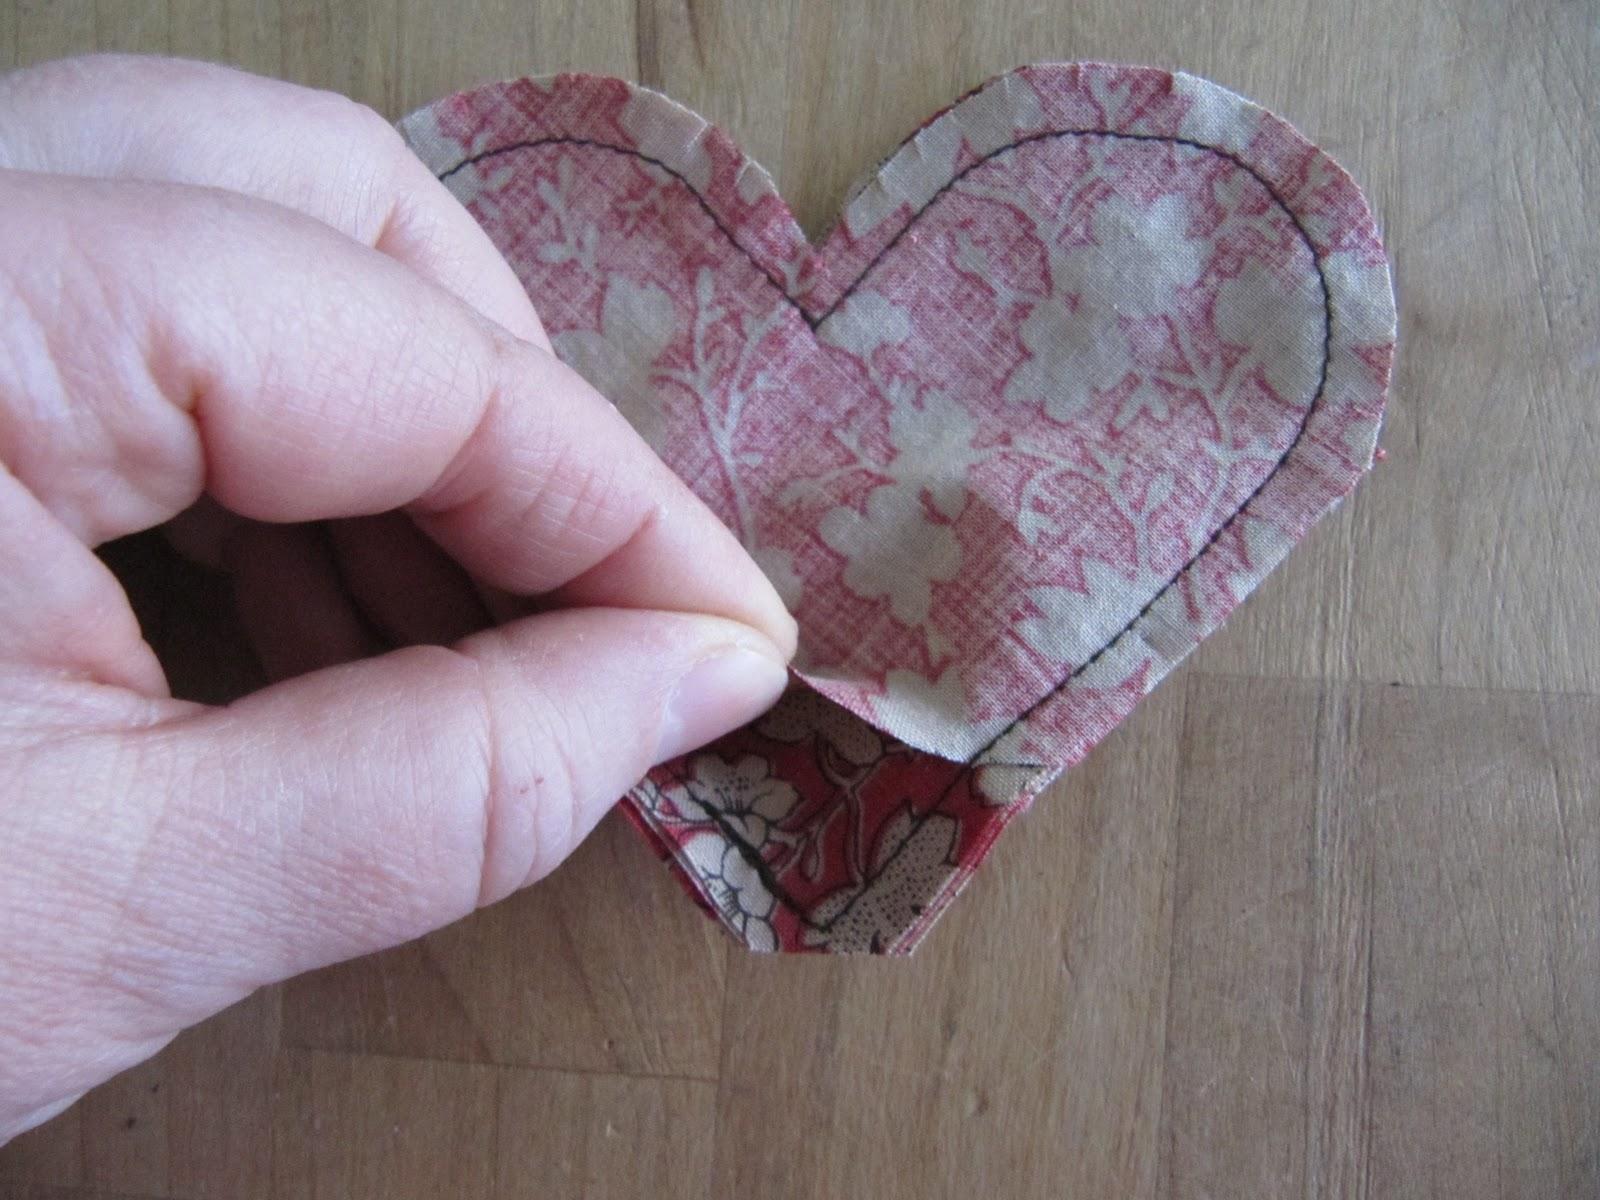 http://3.bp.blogspot.com/-kp7QKJyIcTE/TwJ6zoewVAI/AAAAAAAAMB0/QxjO8cRNrX8/s1600/heart+bookmark+039.jpg